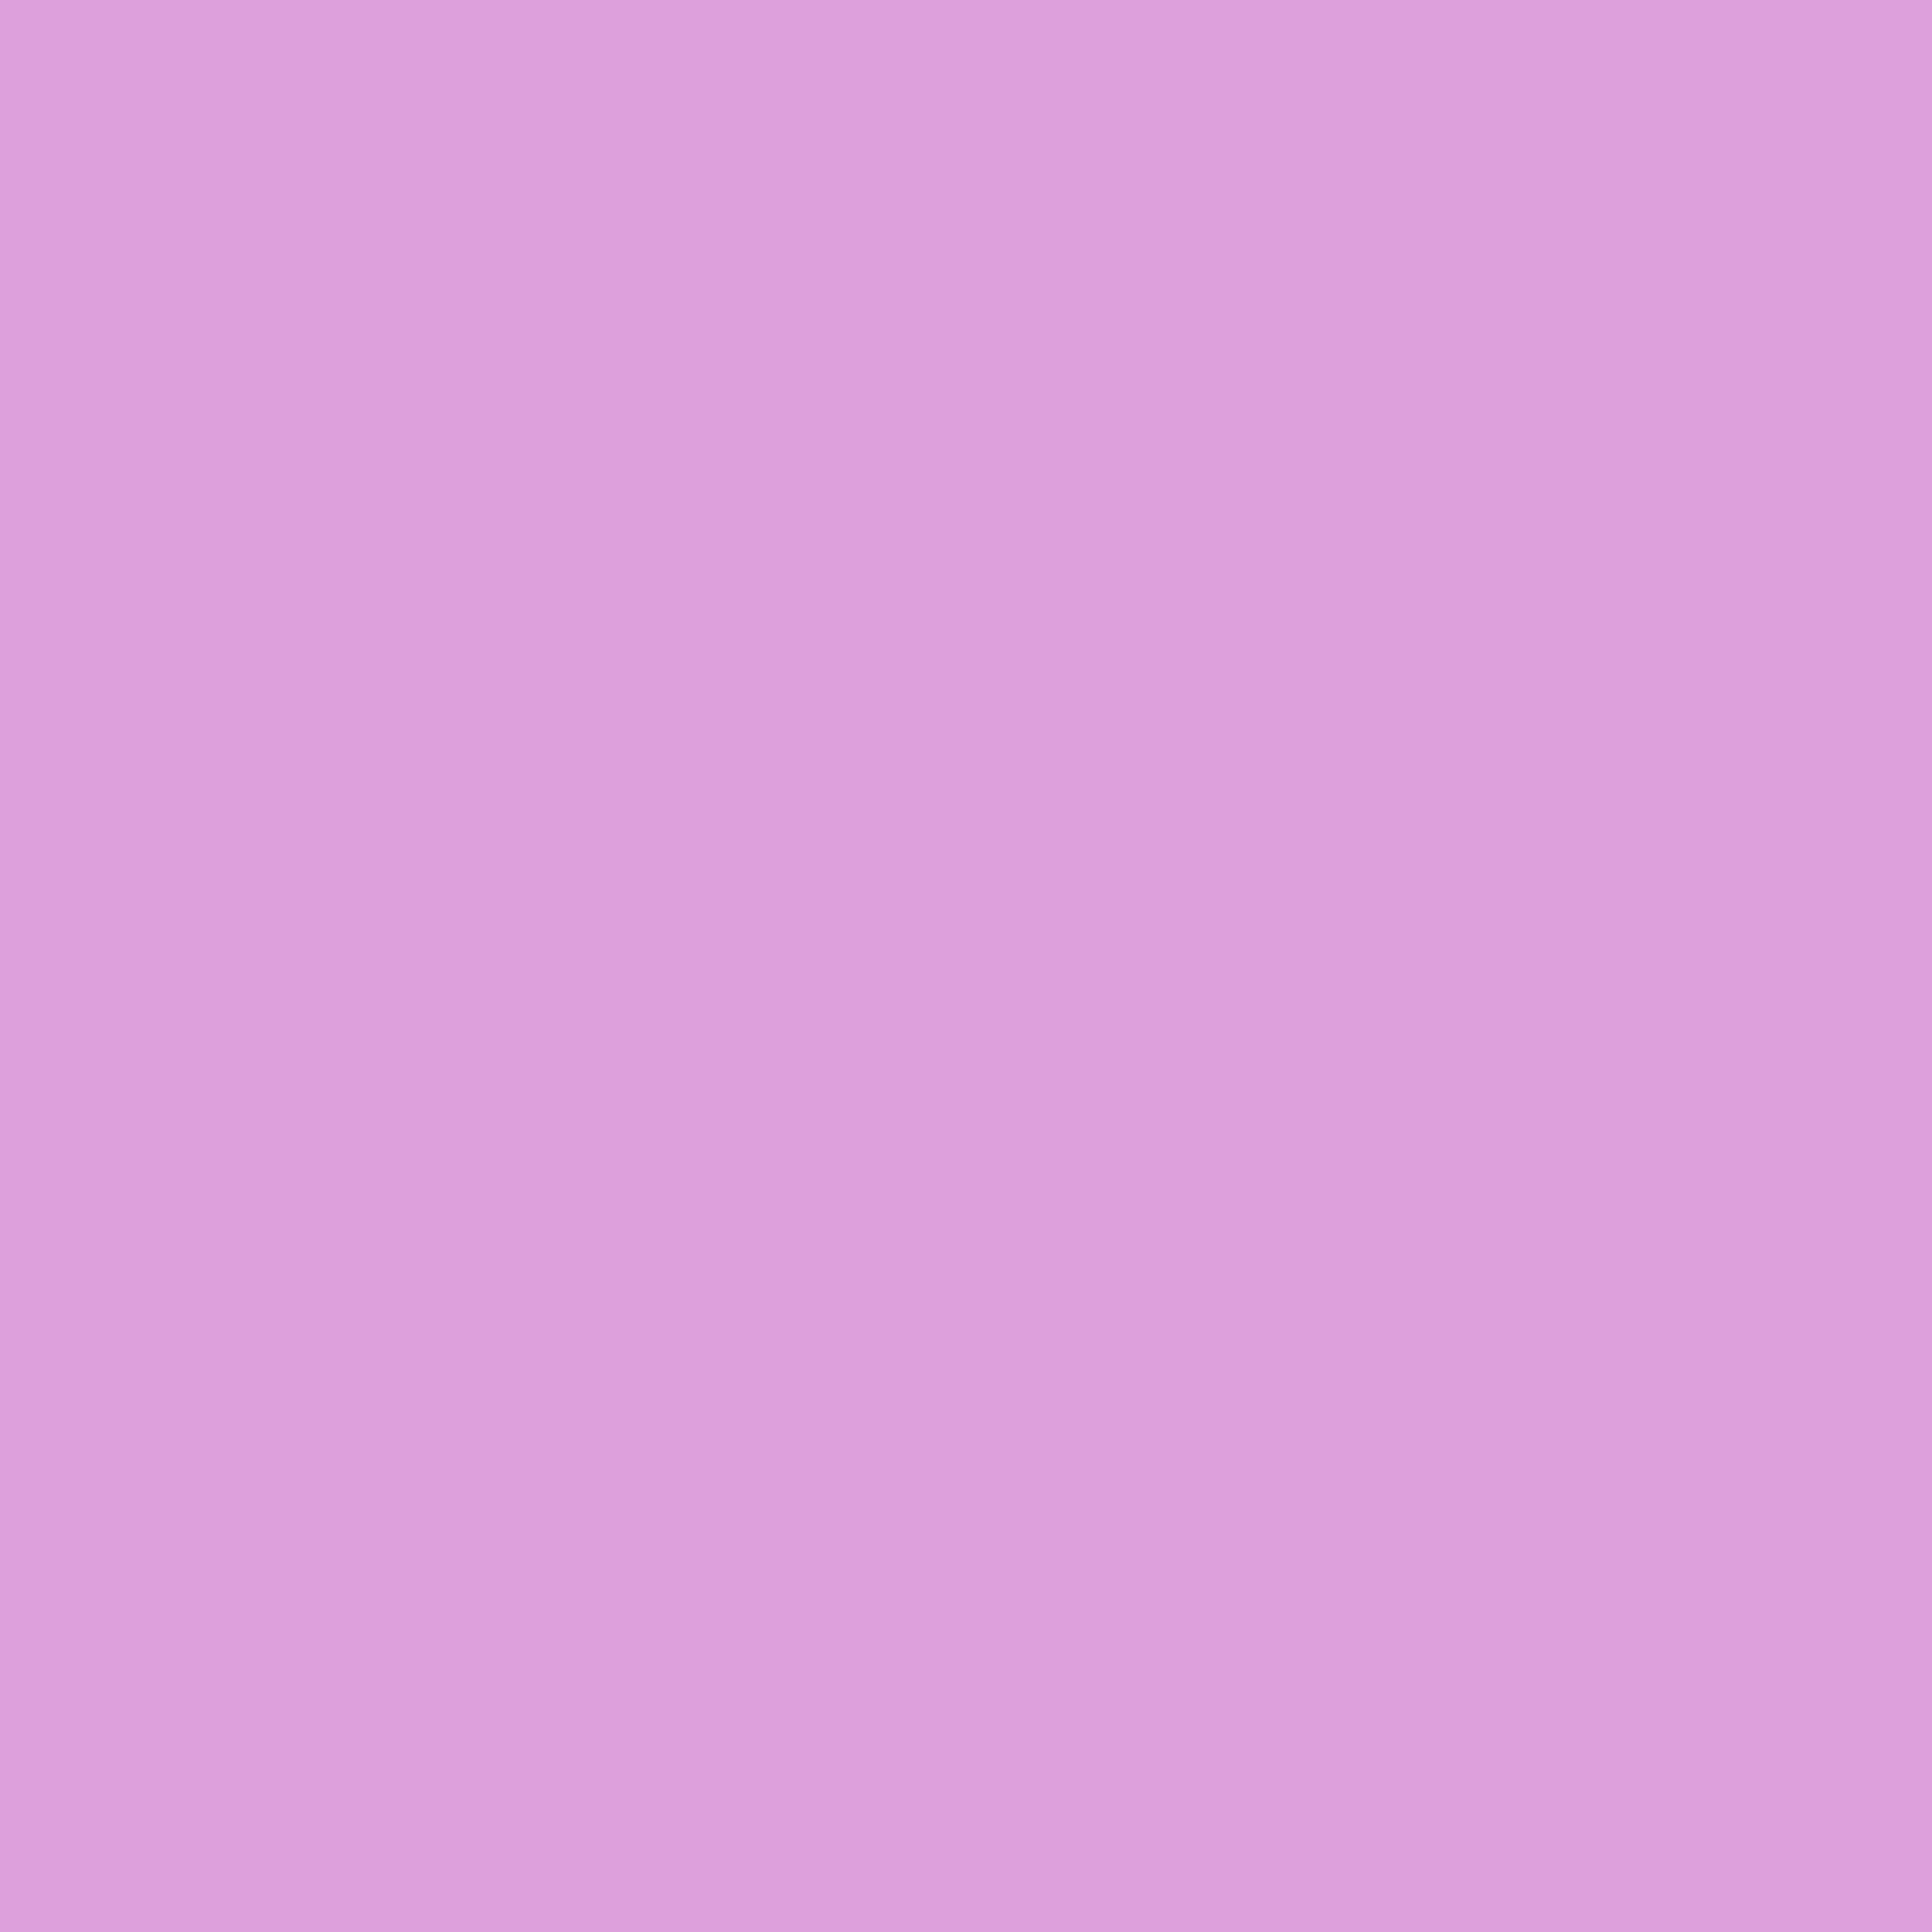 3600x3600 Pale Plum Solid Color Background